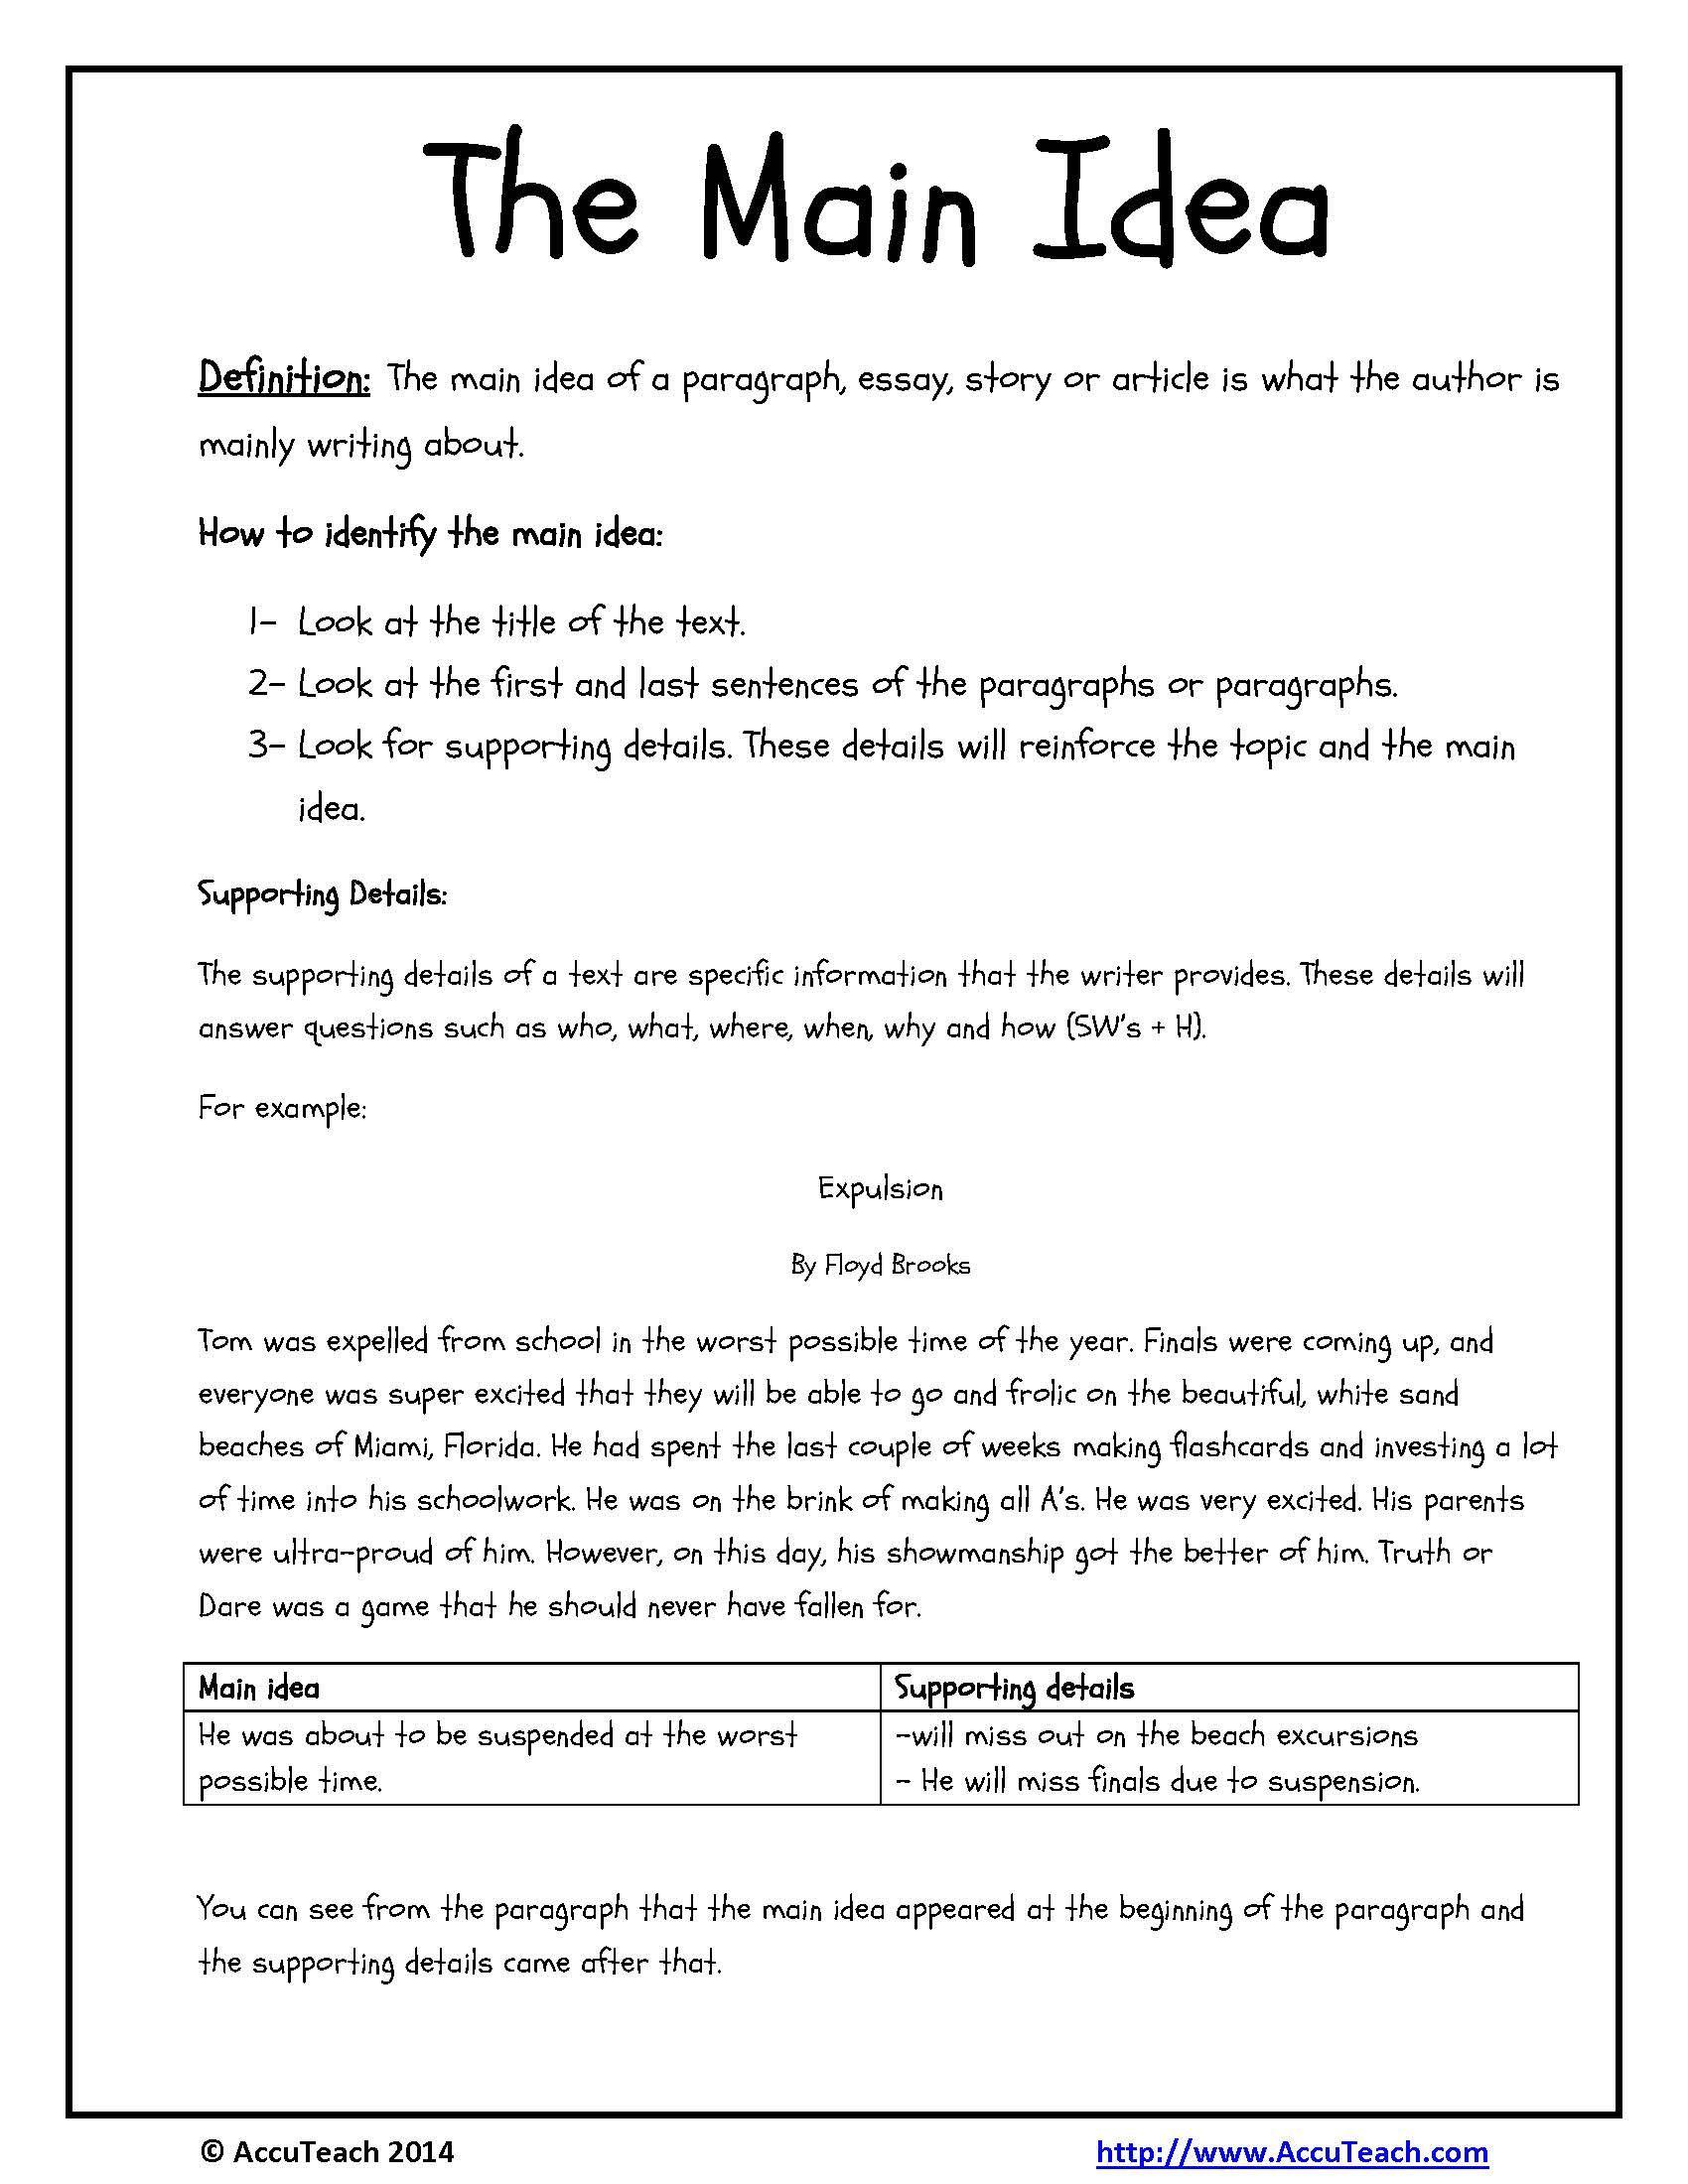 Reading Comprehension Strategies Main Idea Worksheets Compkormay Main Idea Worksheet First Grade Worksheets Main Idea Third Grade